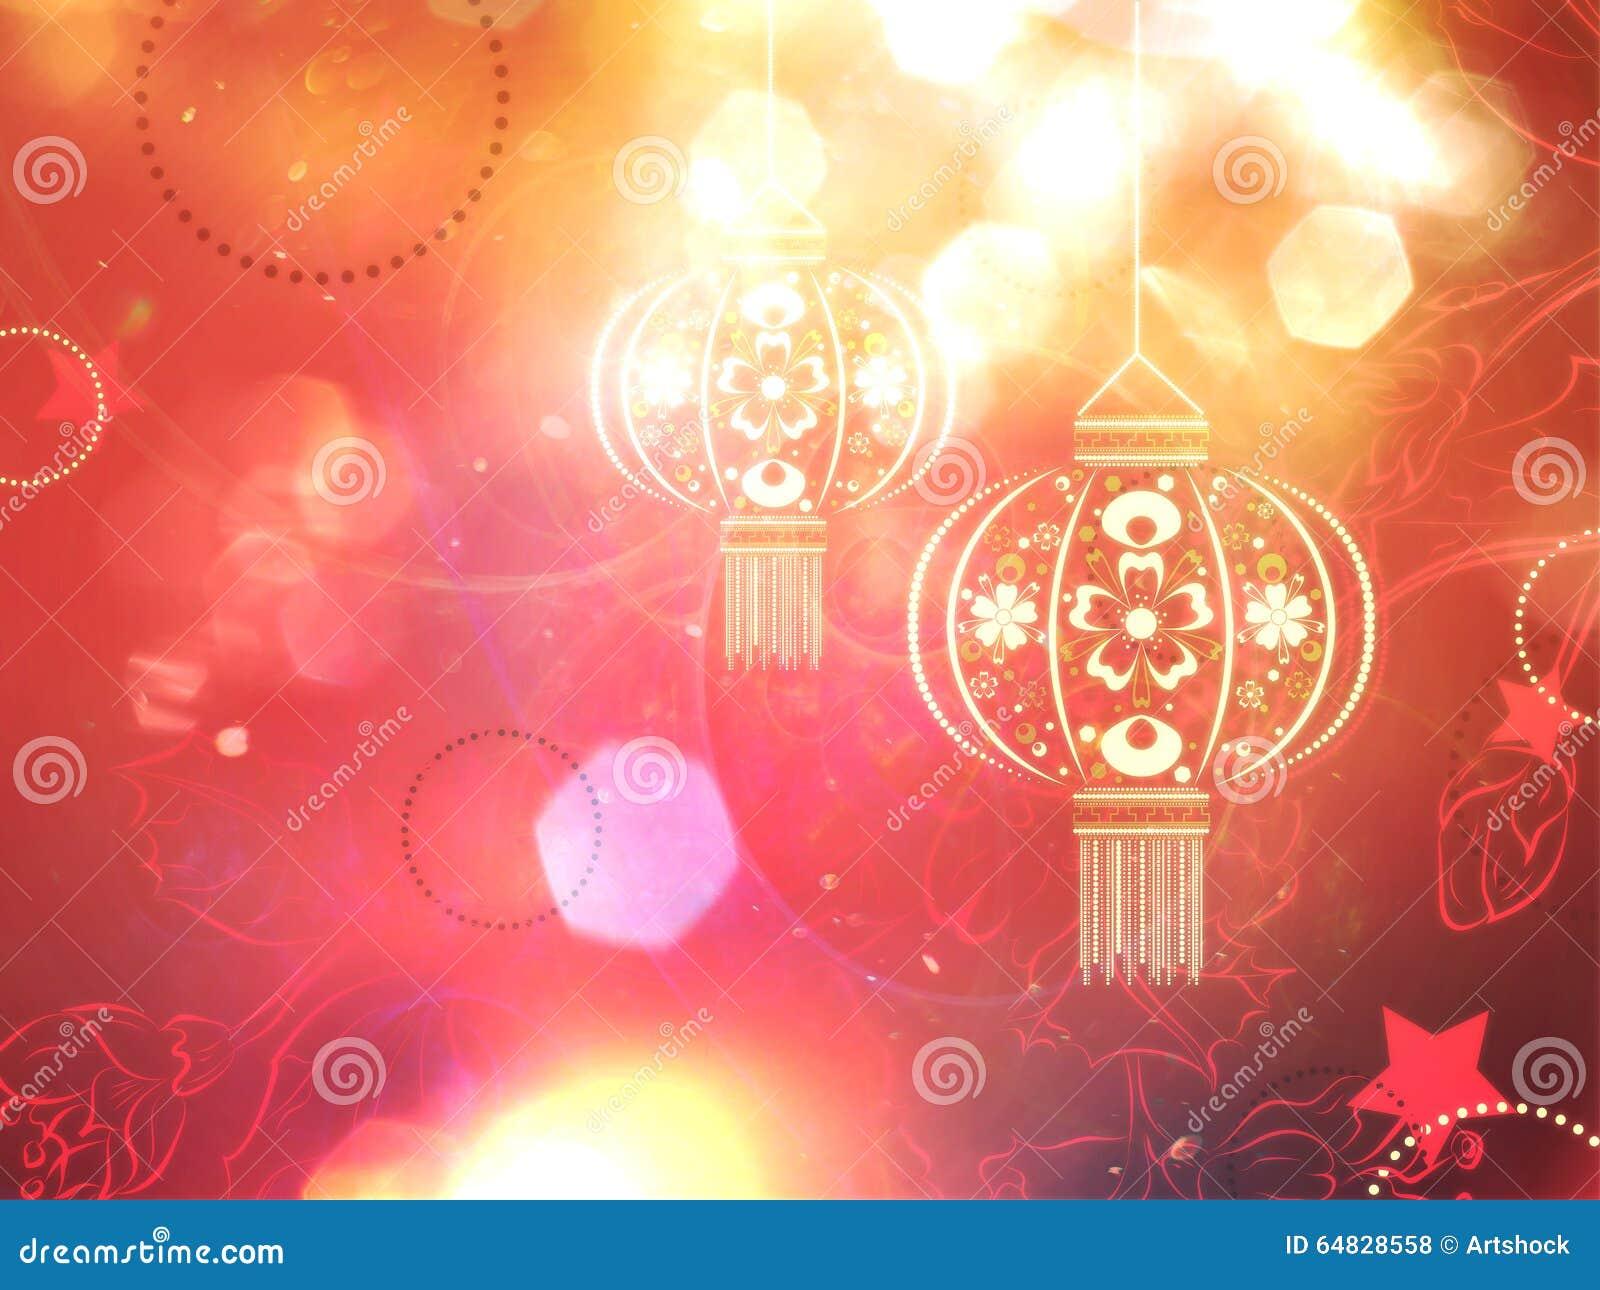 Paper Lantern With Flowers Stock Illustration Illustration Of